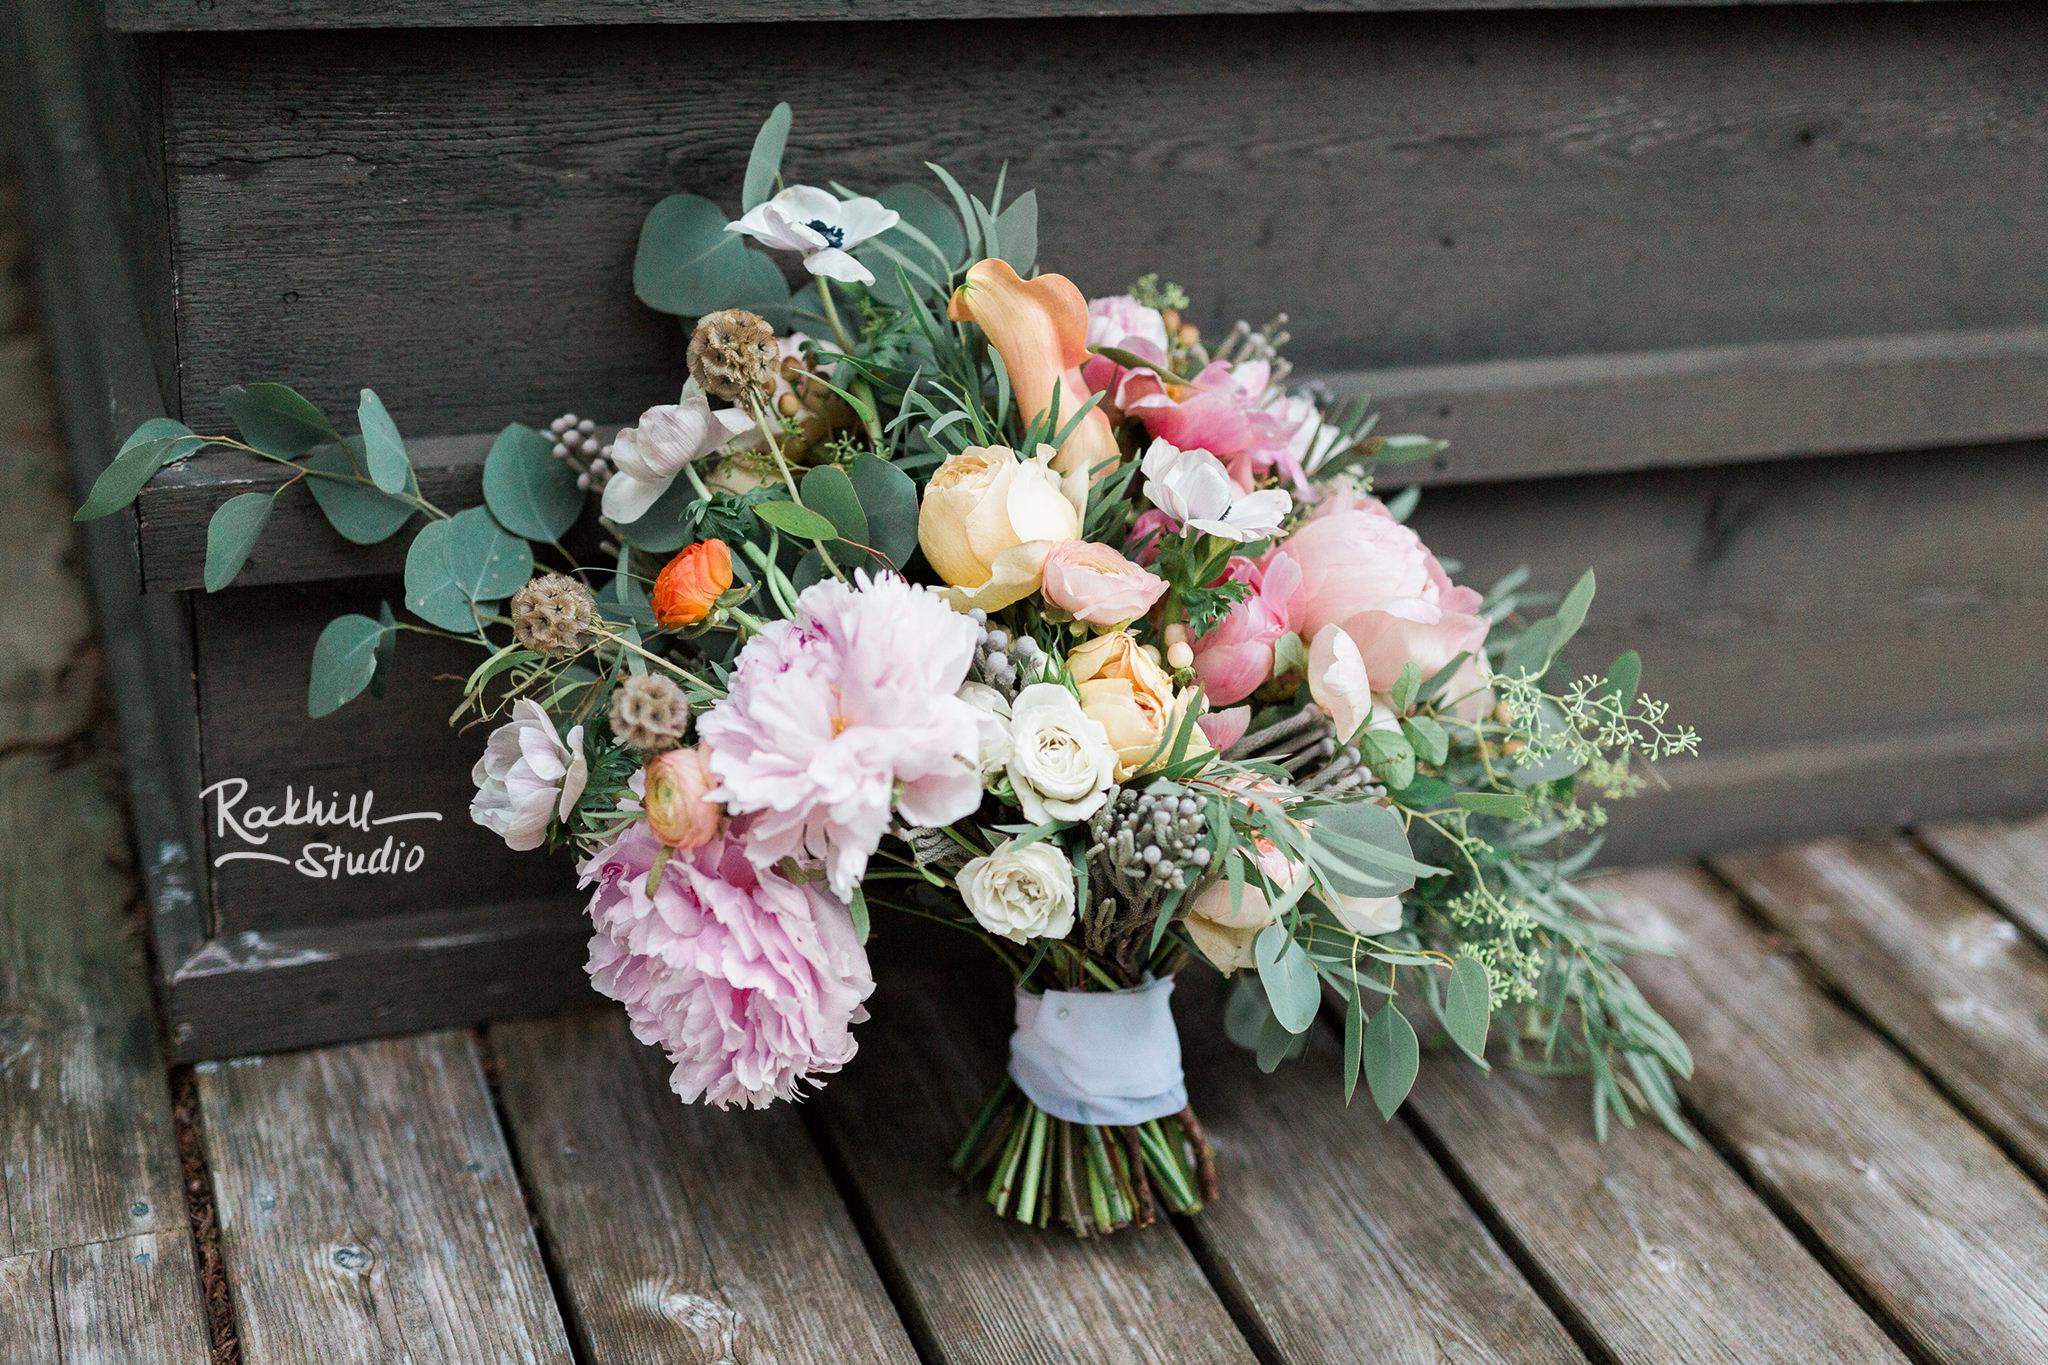 Drummond Island Wedding, Bride bouquet, Traverse City Wedding Photographer Rockhill Studio